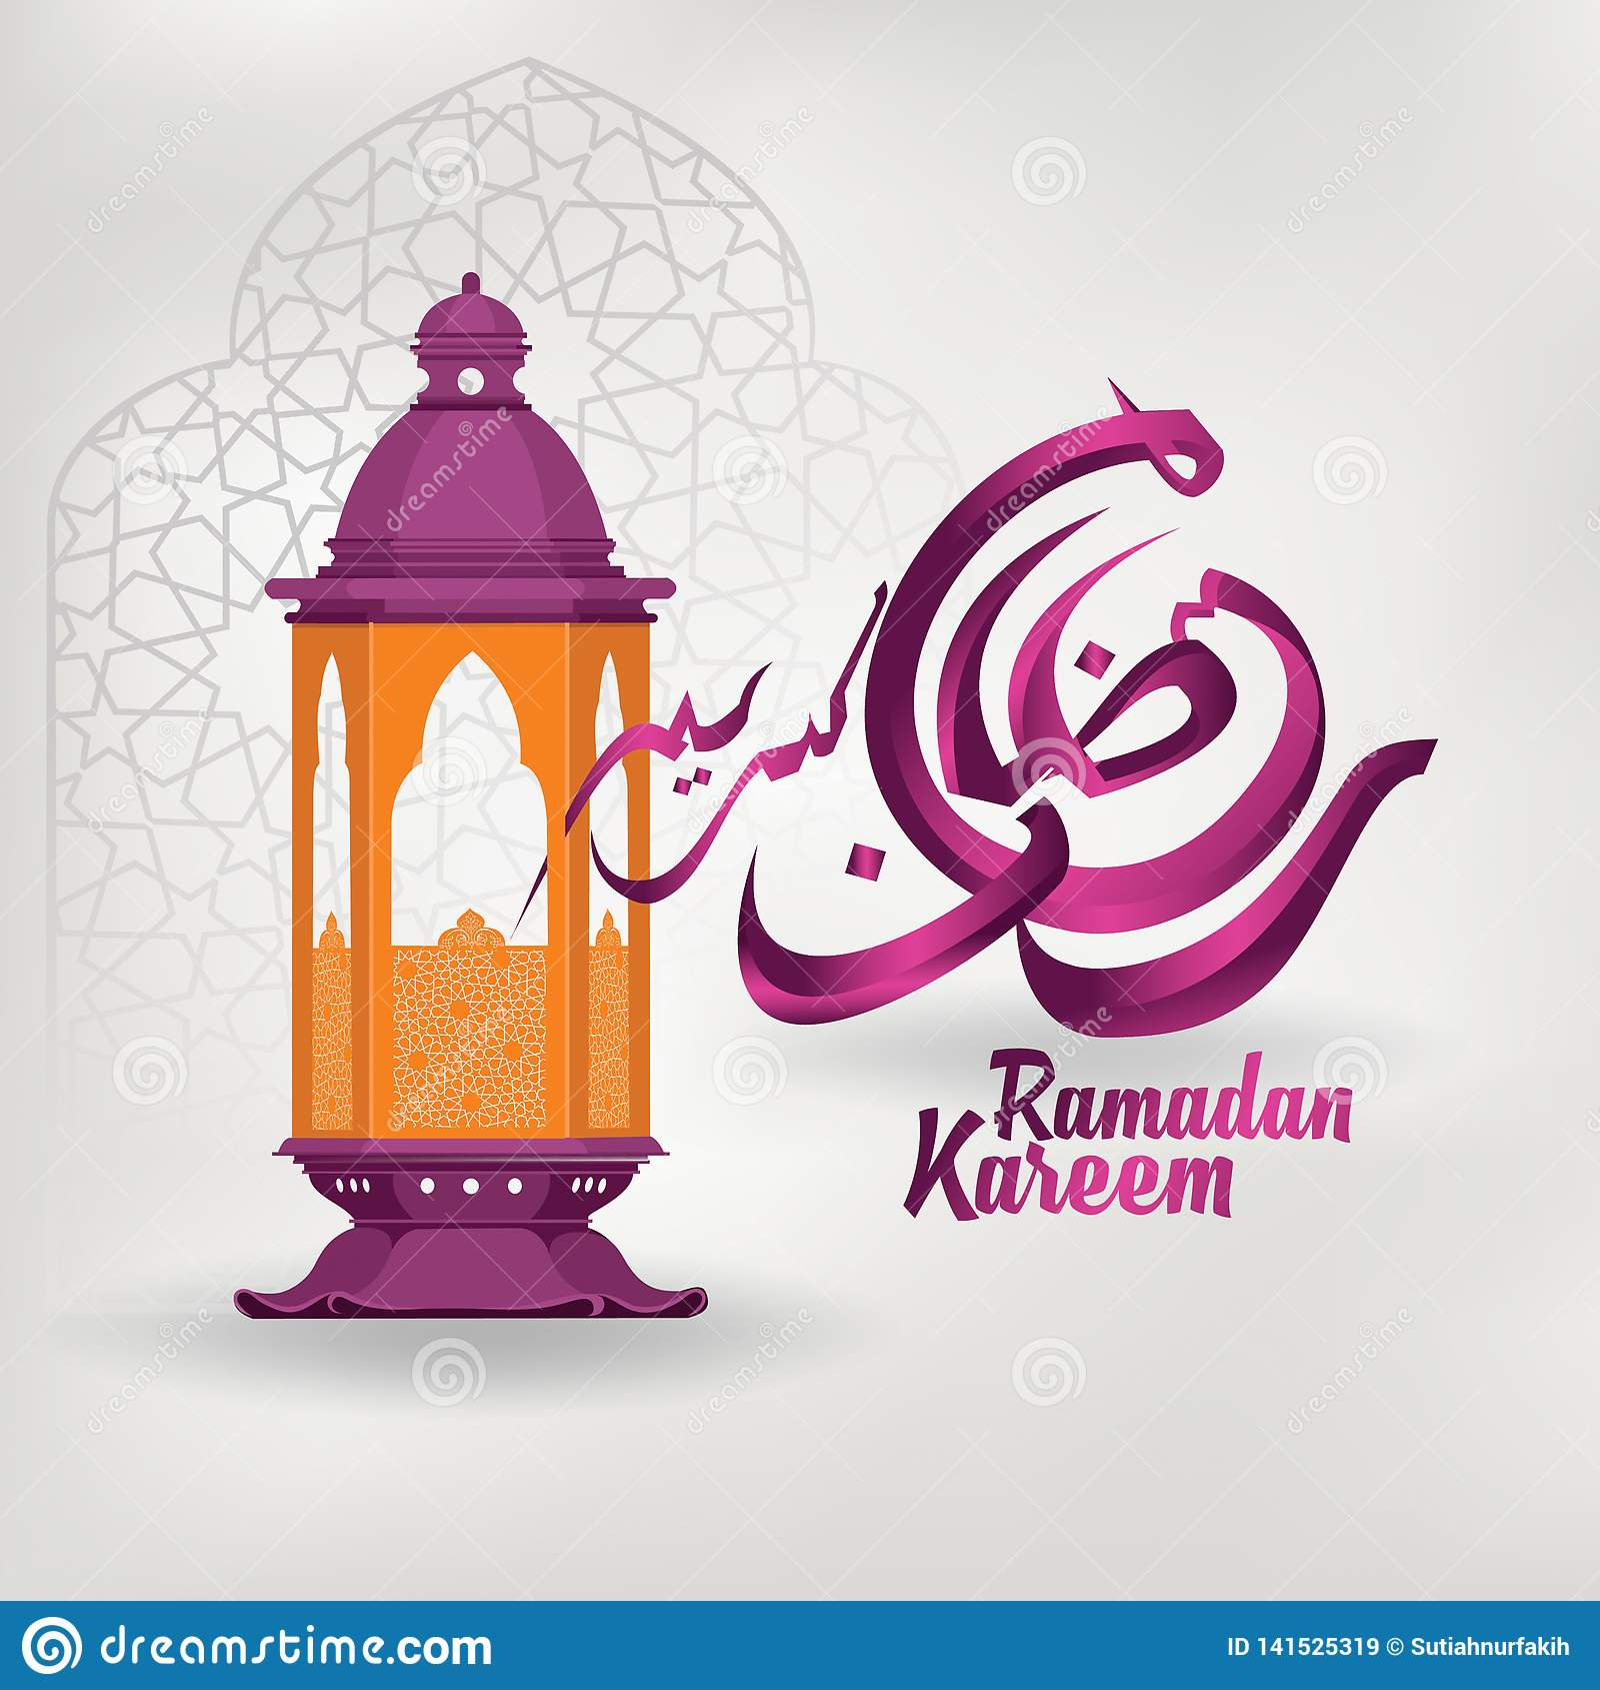 Ramadan Kareem arabic calligraphy and lantern for islamic greeting and mosque dome silhouette.